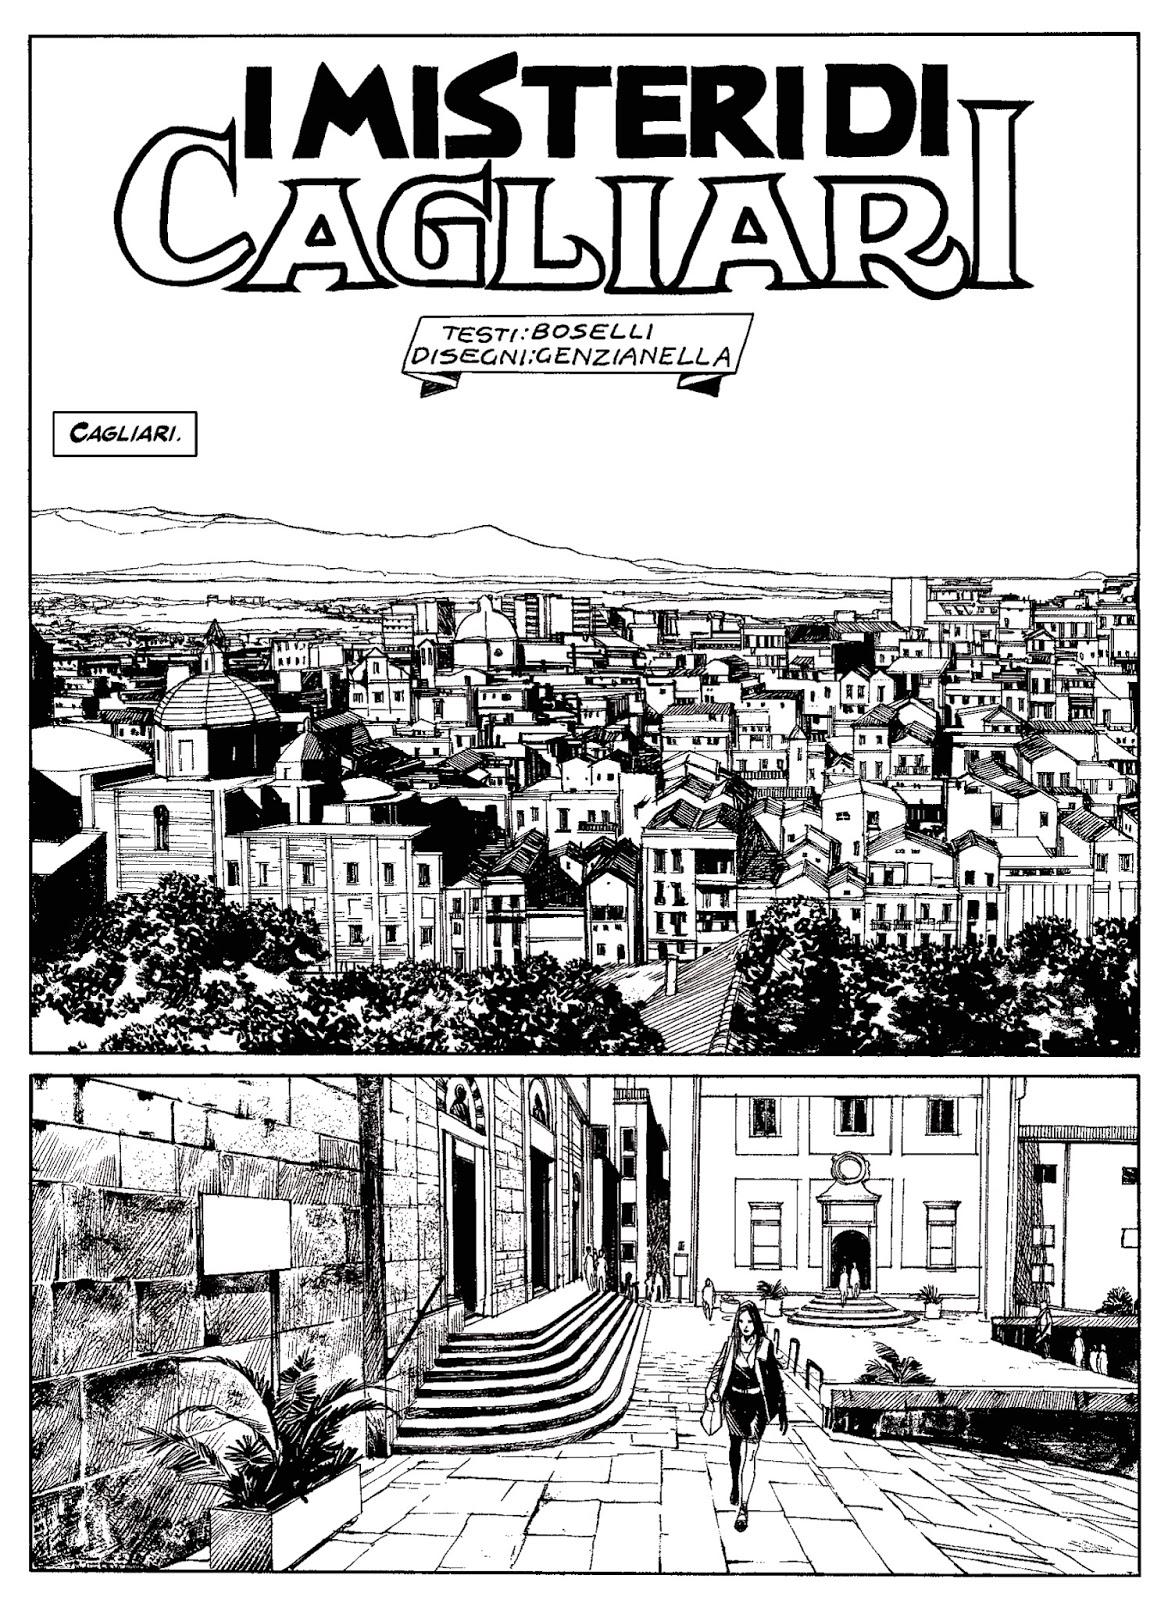 Testata Dampyr 193 Cagliari